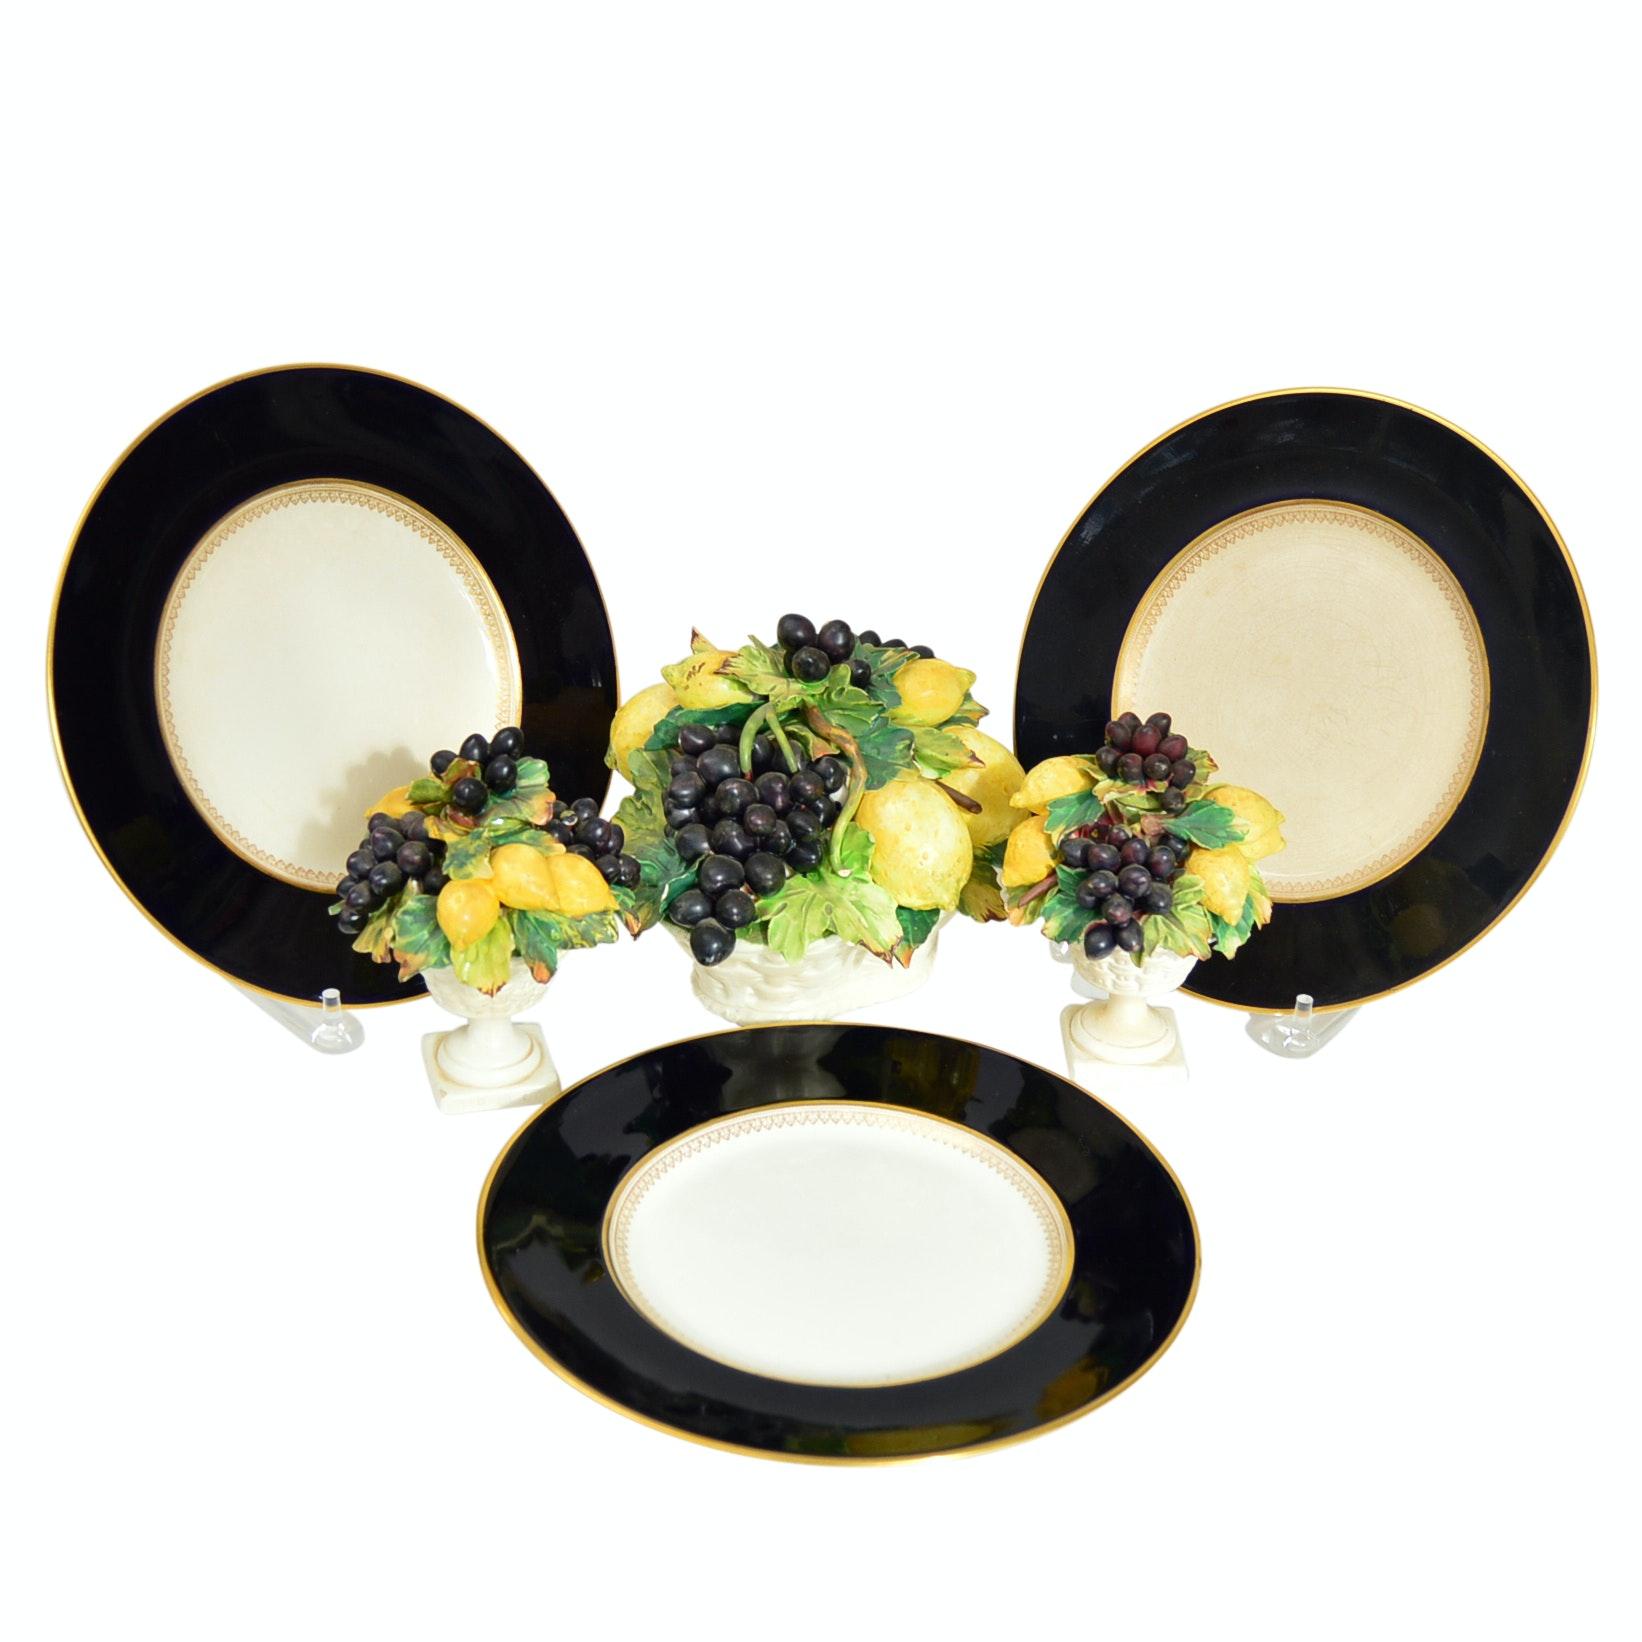 English Fondeville Bone China Plates and Italian Porcelain Centerpiece Set